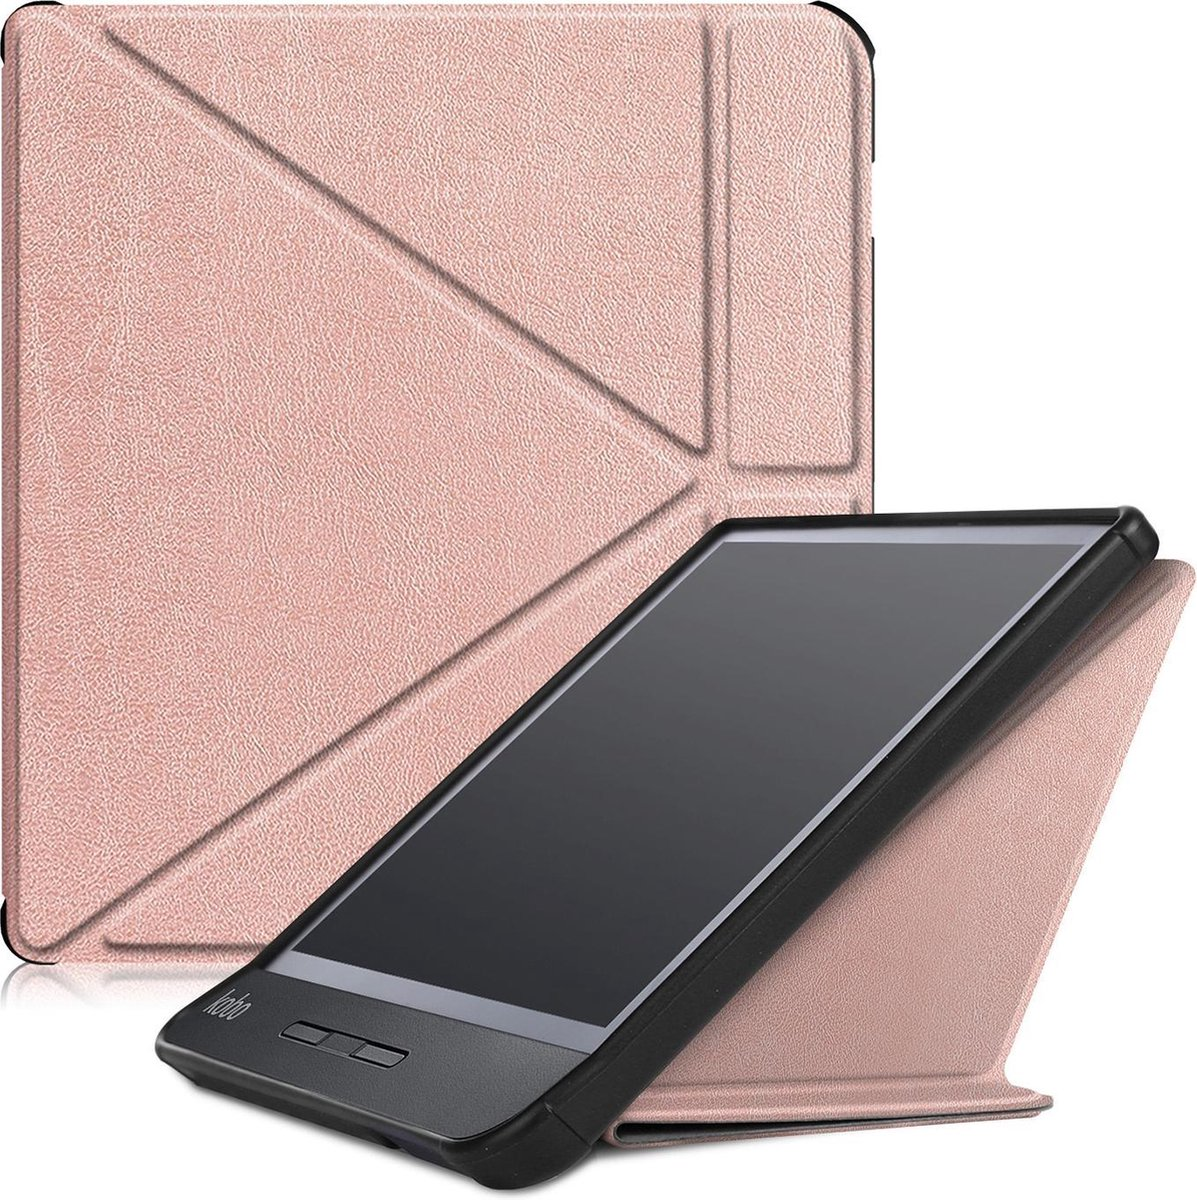 Kobo Libra H2O hoesje - Tri-Fold Book Case - Ros  Goud